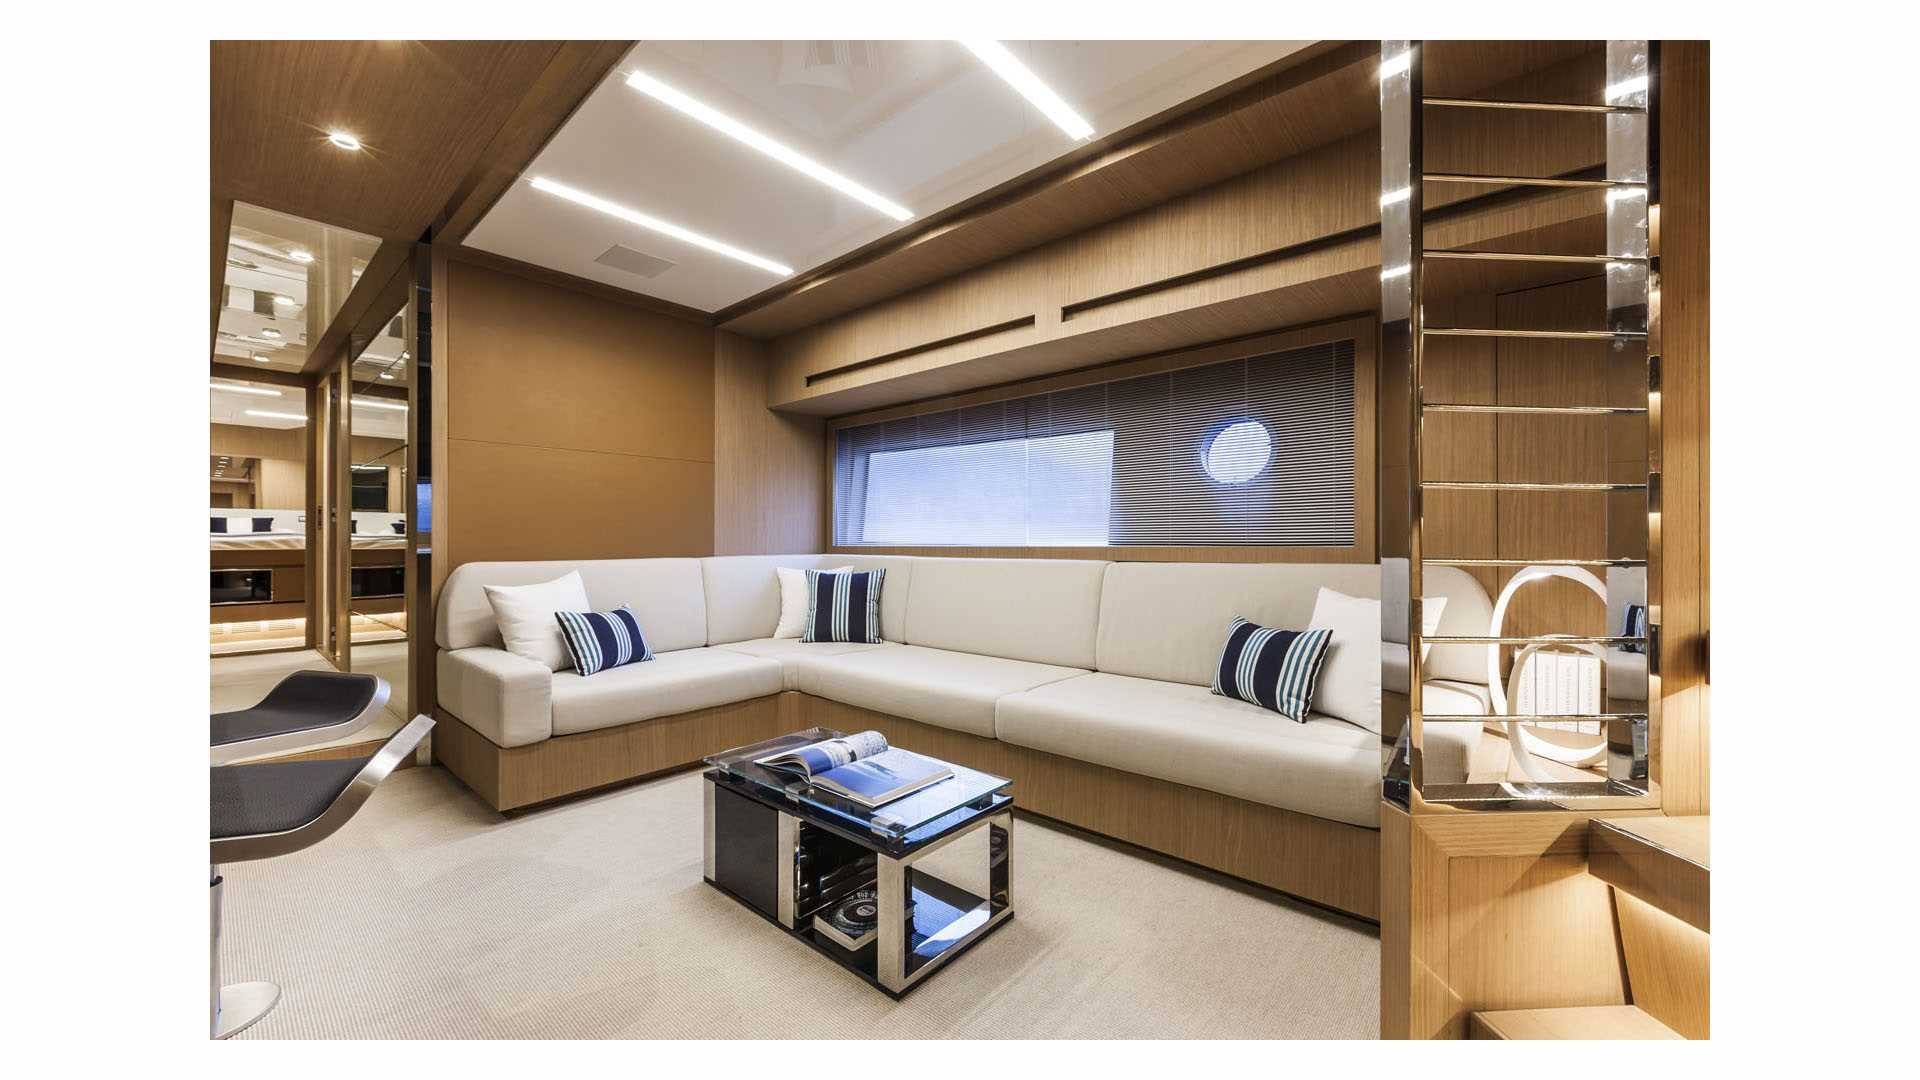 luxusni jachta Riva 88 Florida interier